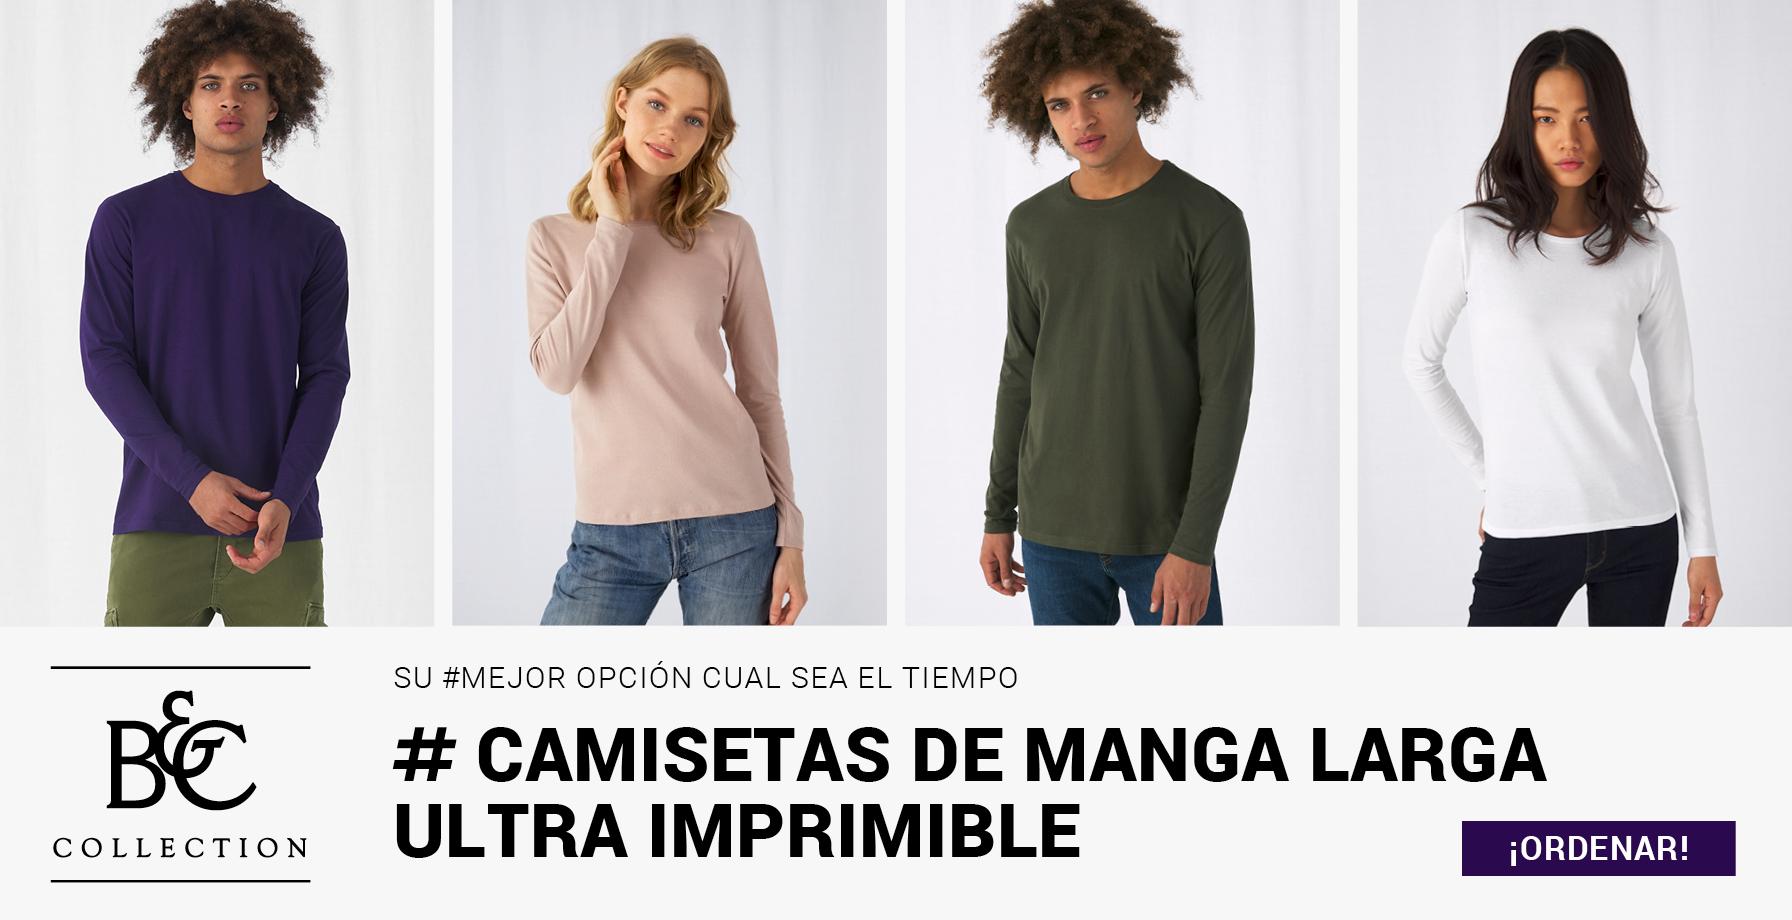 B&C - CAMISETAS DE MANGA LARGA